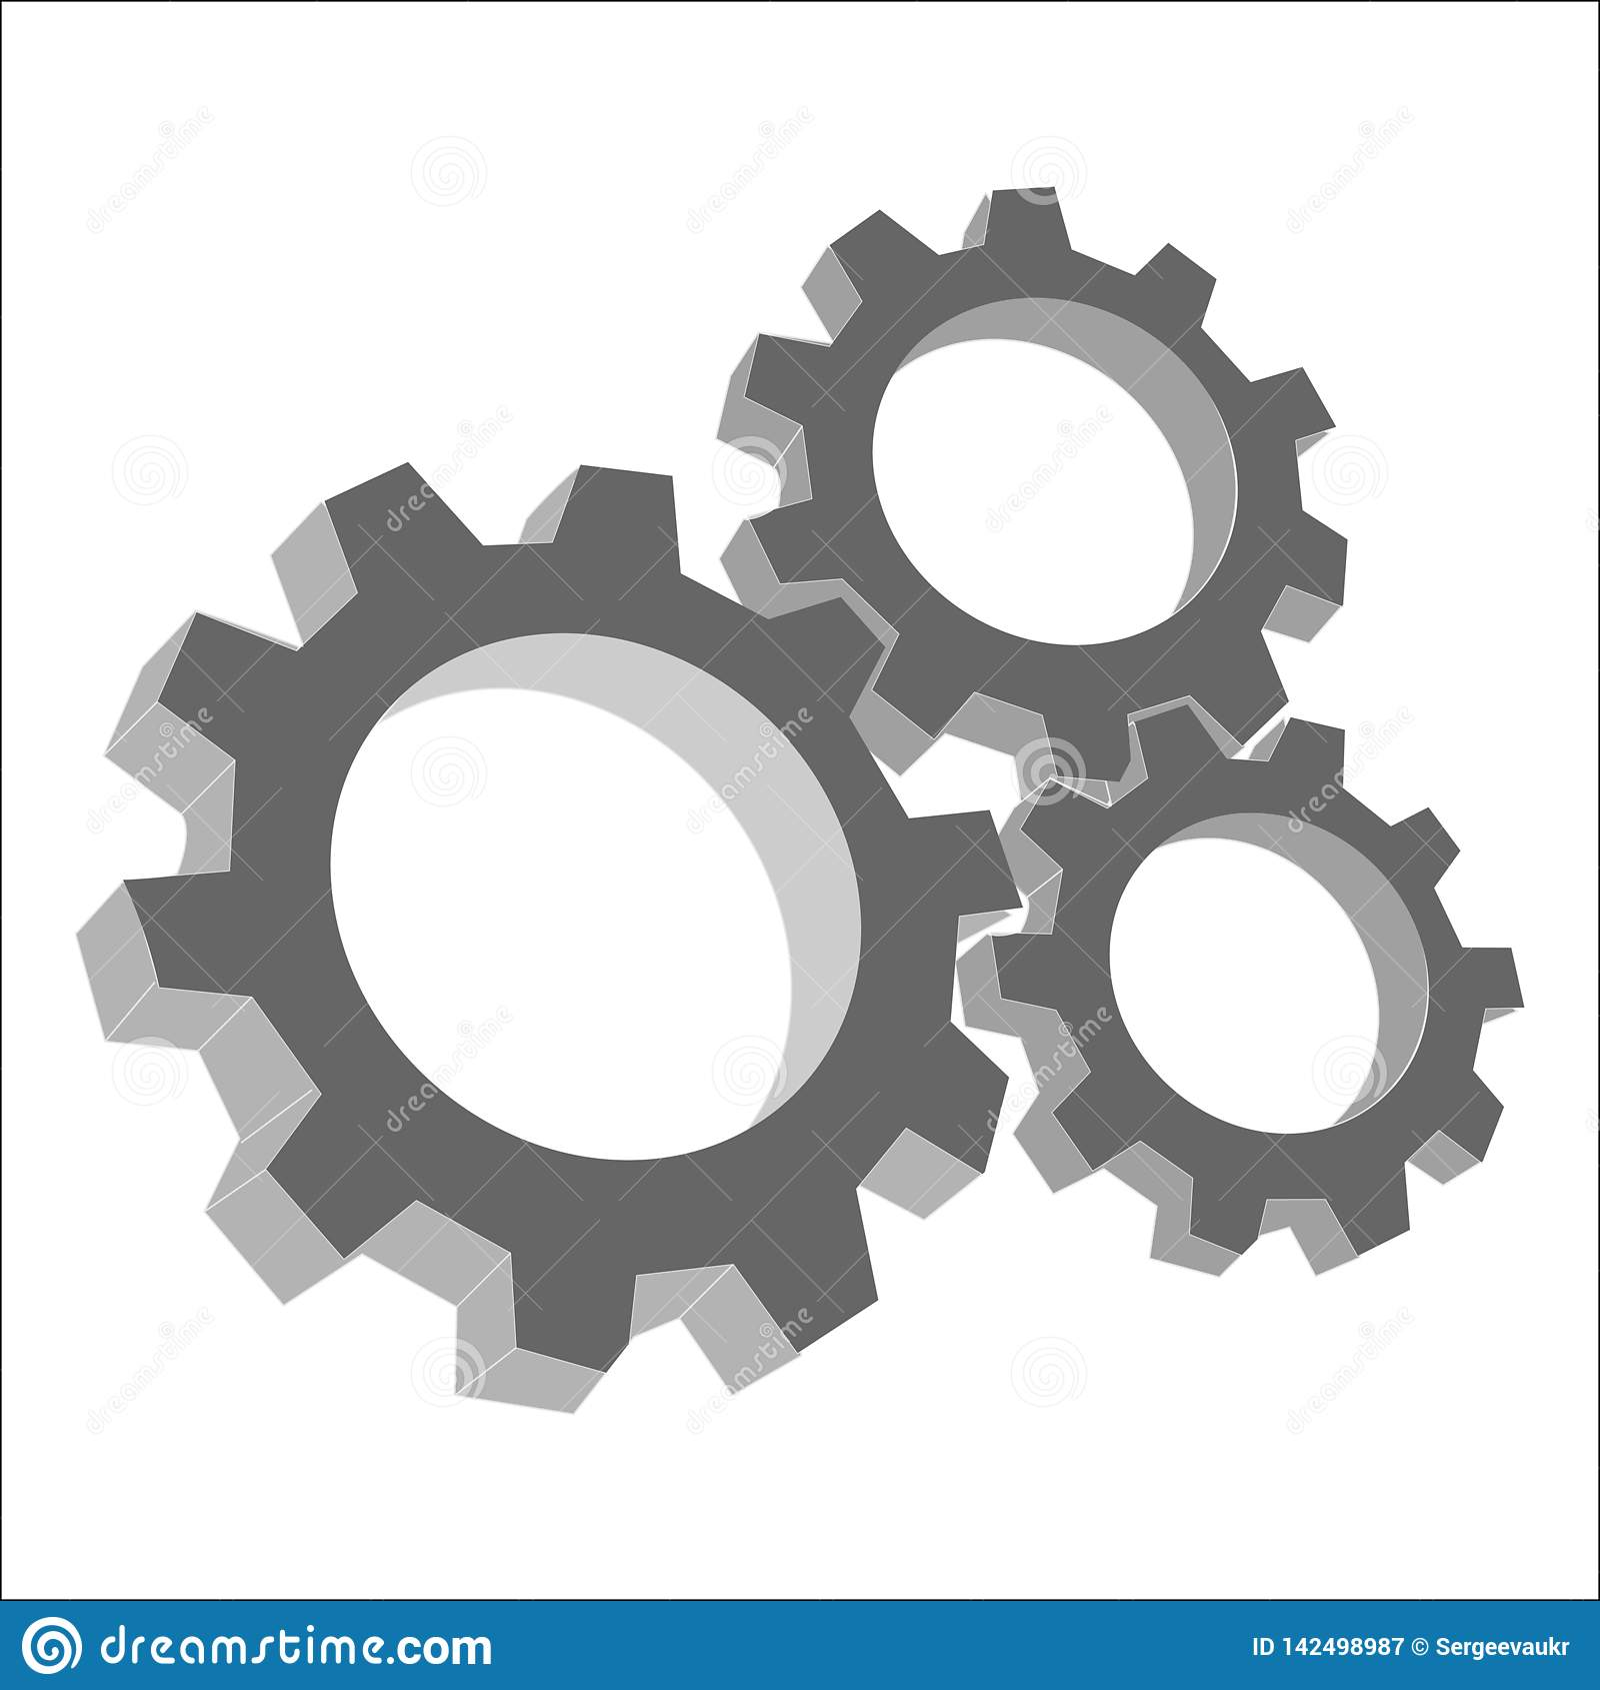 Kugghjul mekanism, exakthet, abstrakt vektor, nheadline